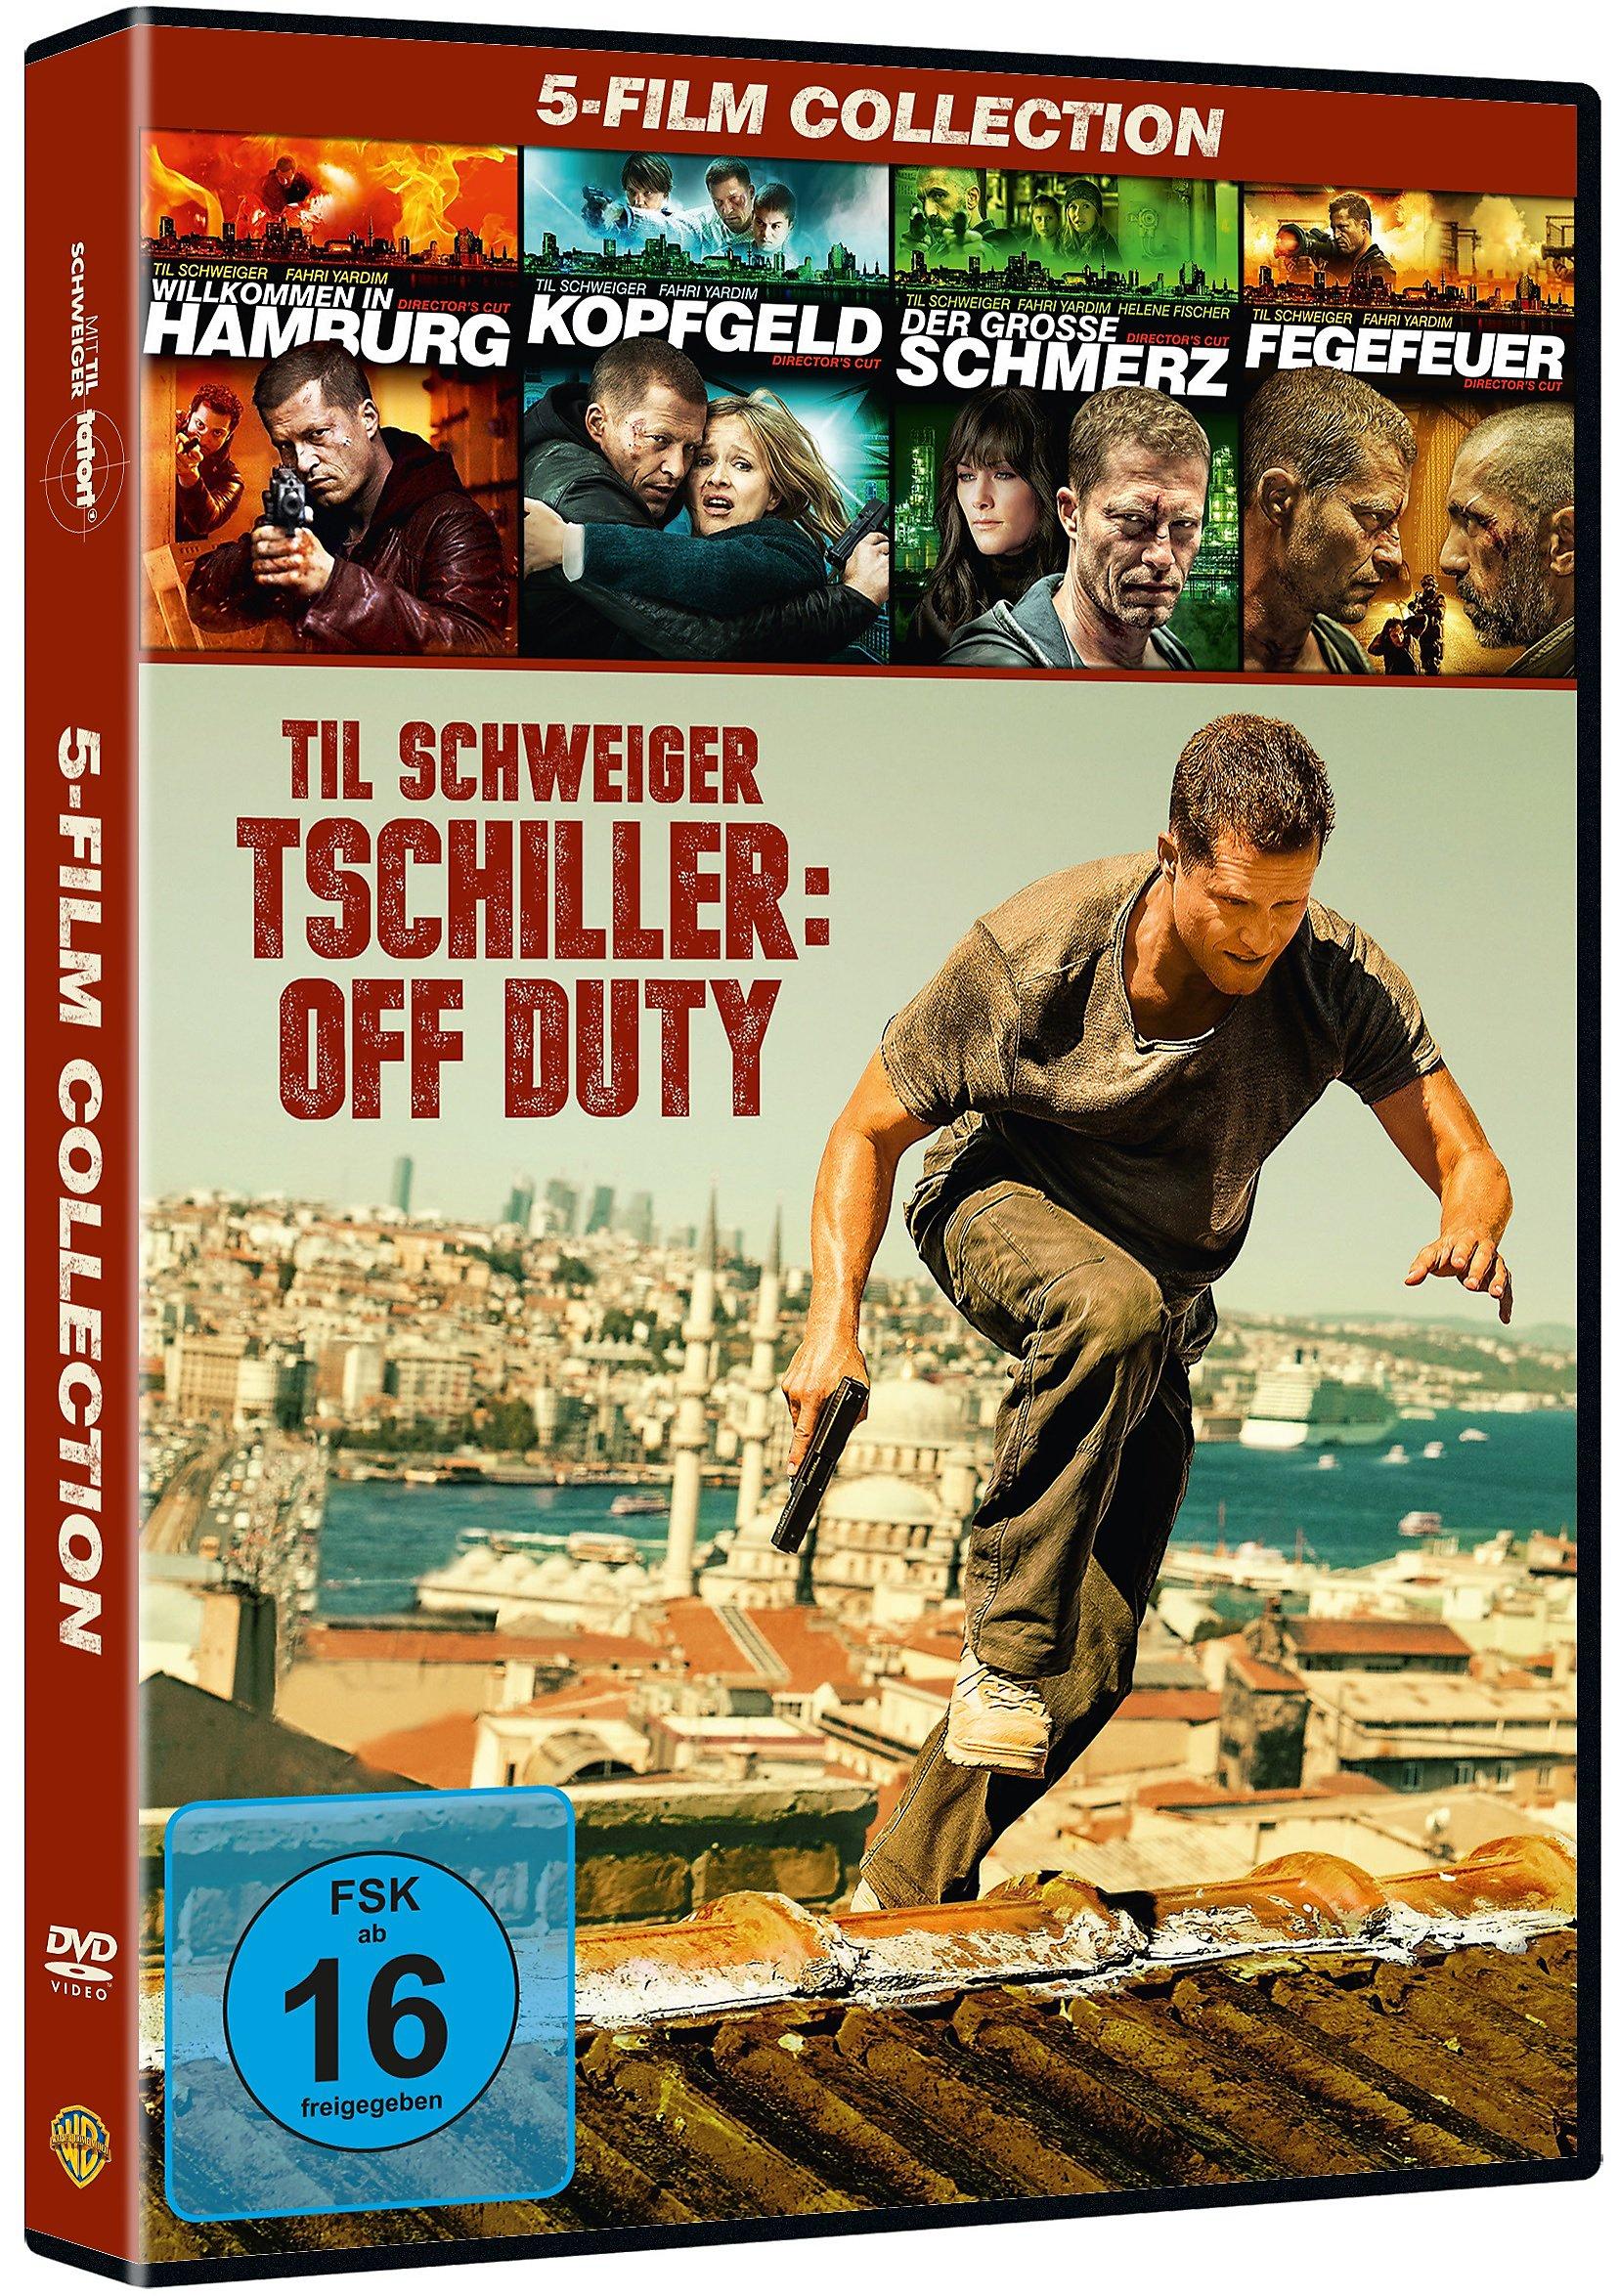 Tschiller Tatort